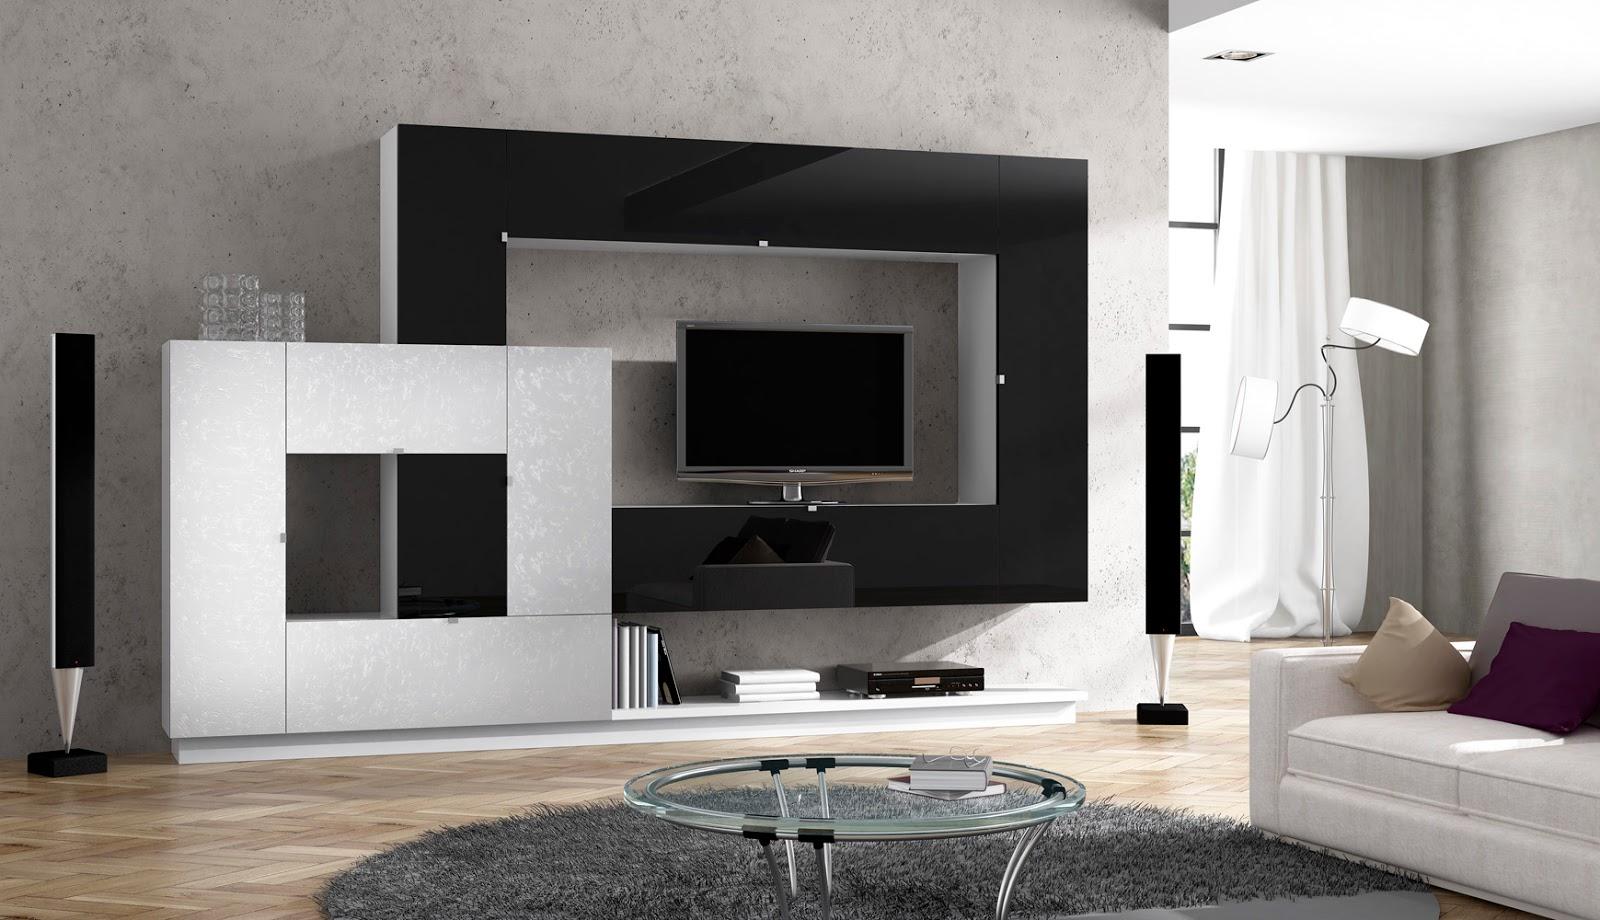 Muebles de moda colecci n next para los m s modernos for Muebles de moda